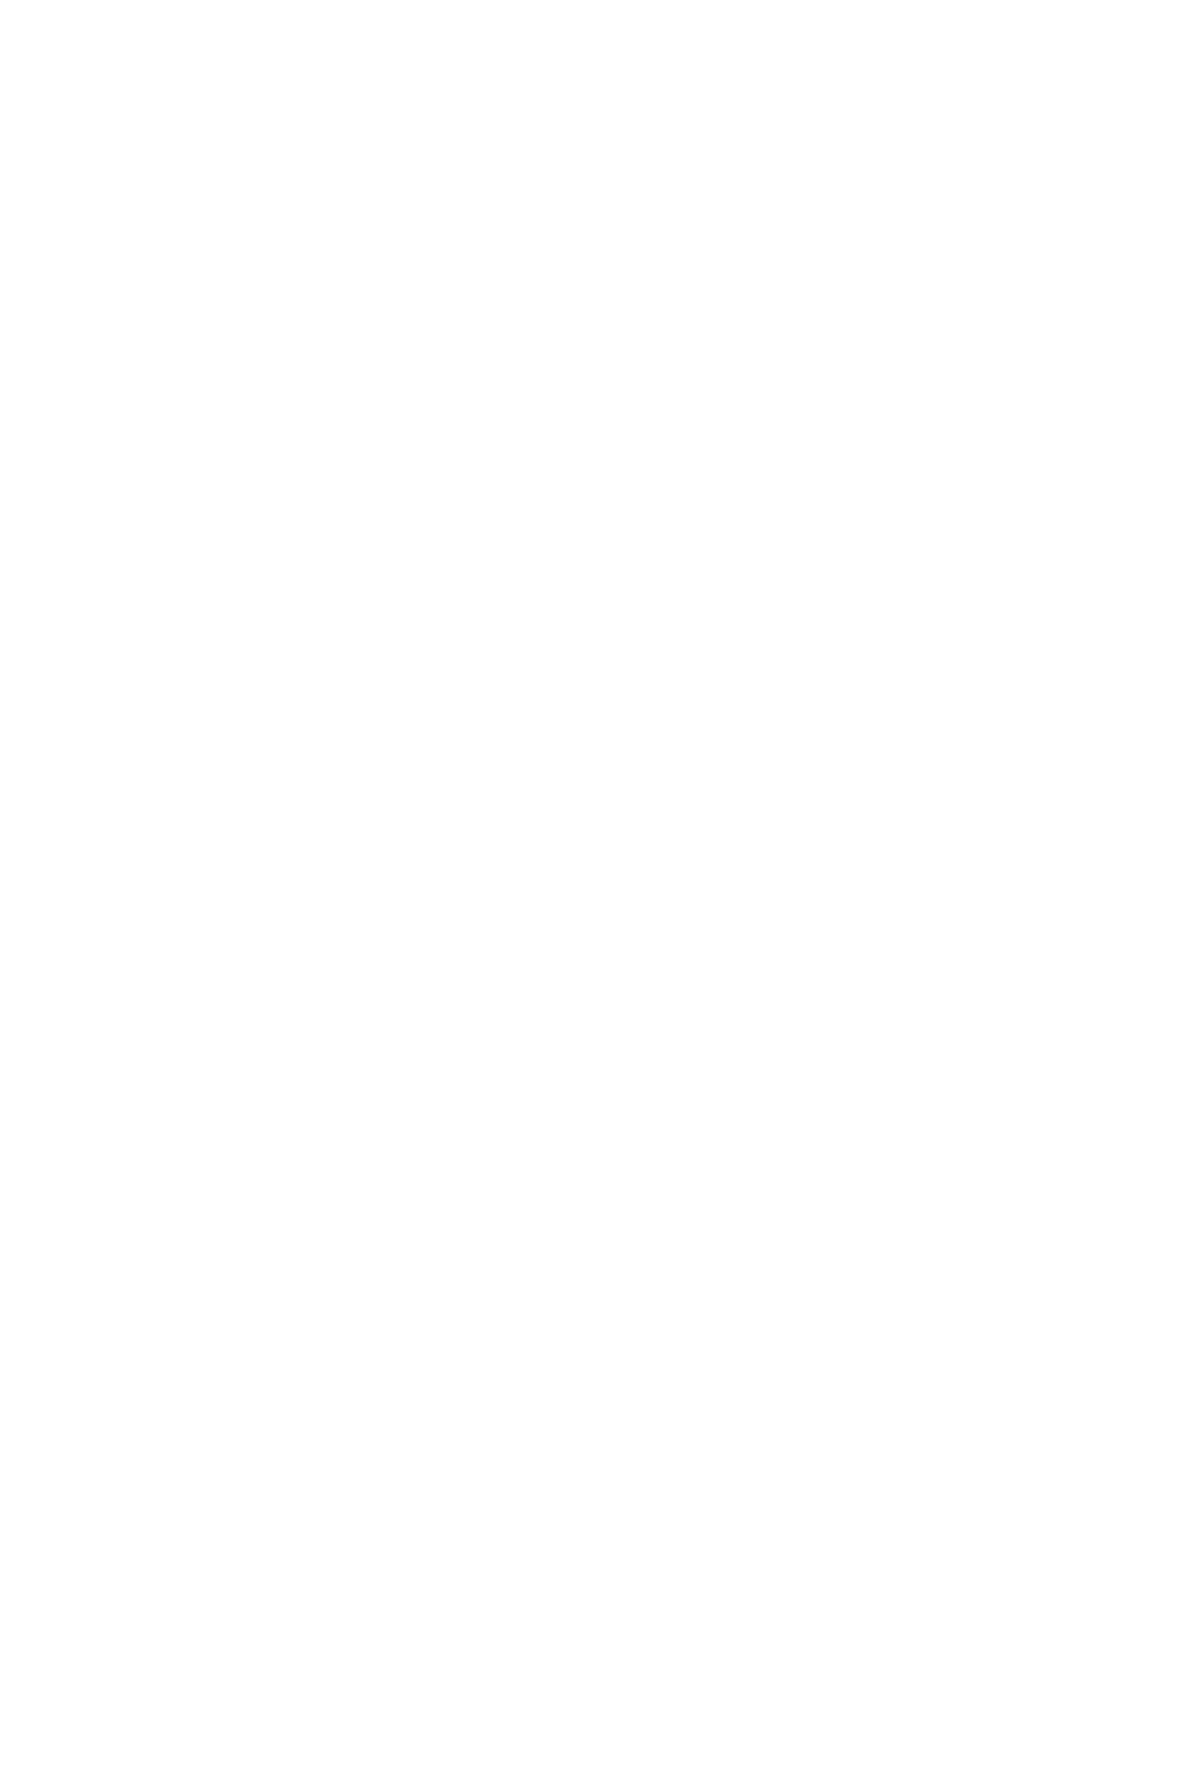 VILLA FONTE POLANICA ZDRÓJ M.2.2